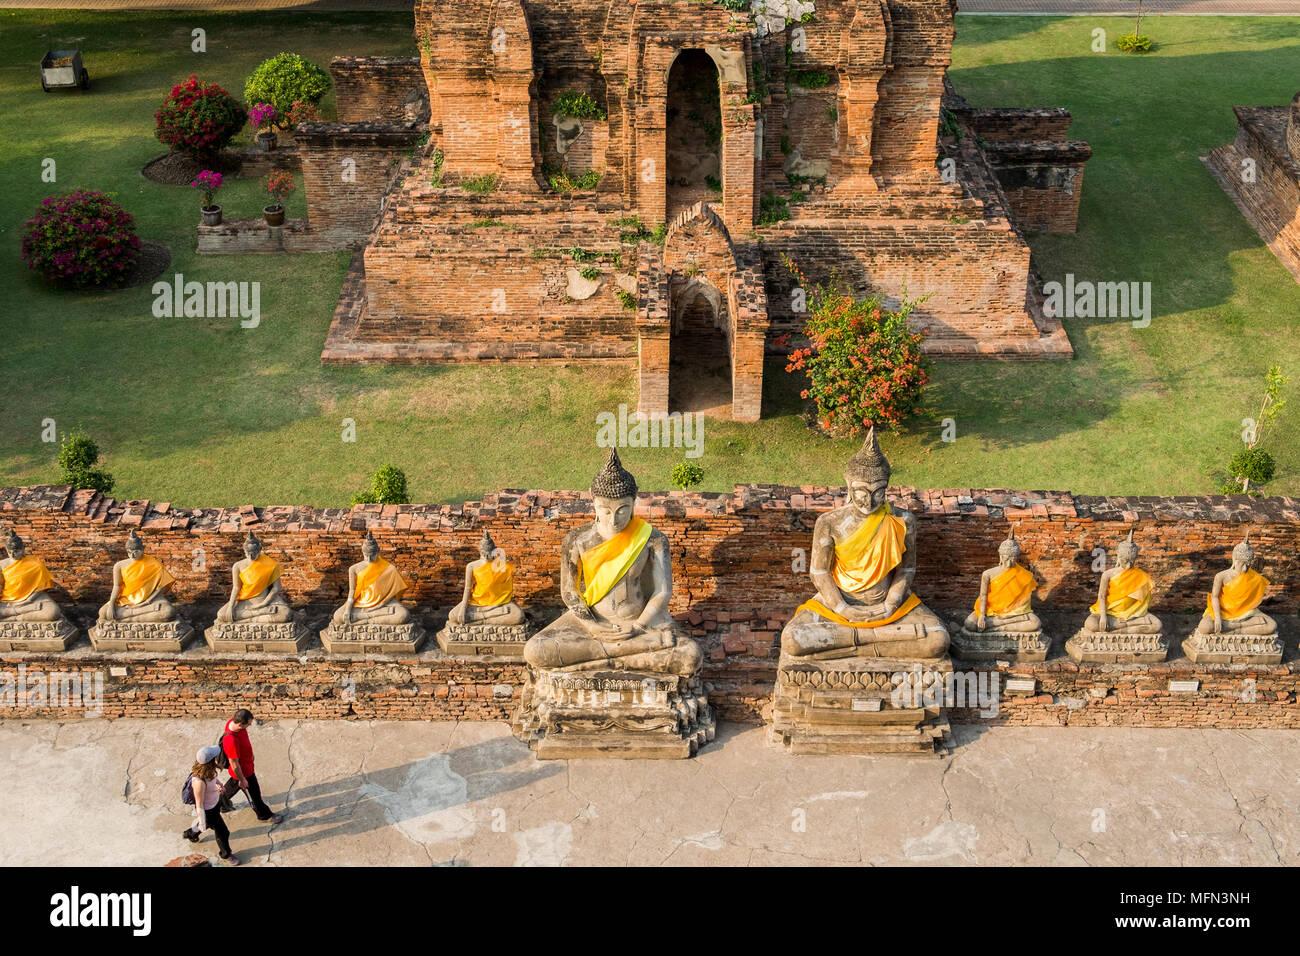 Two visitors walk past a row of Buddha statues at Wat Yai Chai Mongkhon, a 14th century Buddhist temple, Ayutthaya, Thailand. - Stock Image